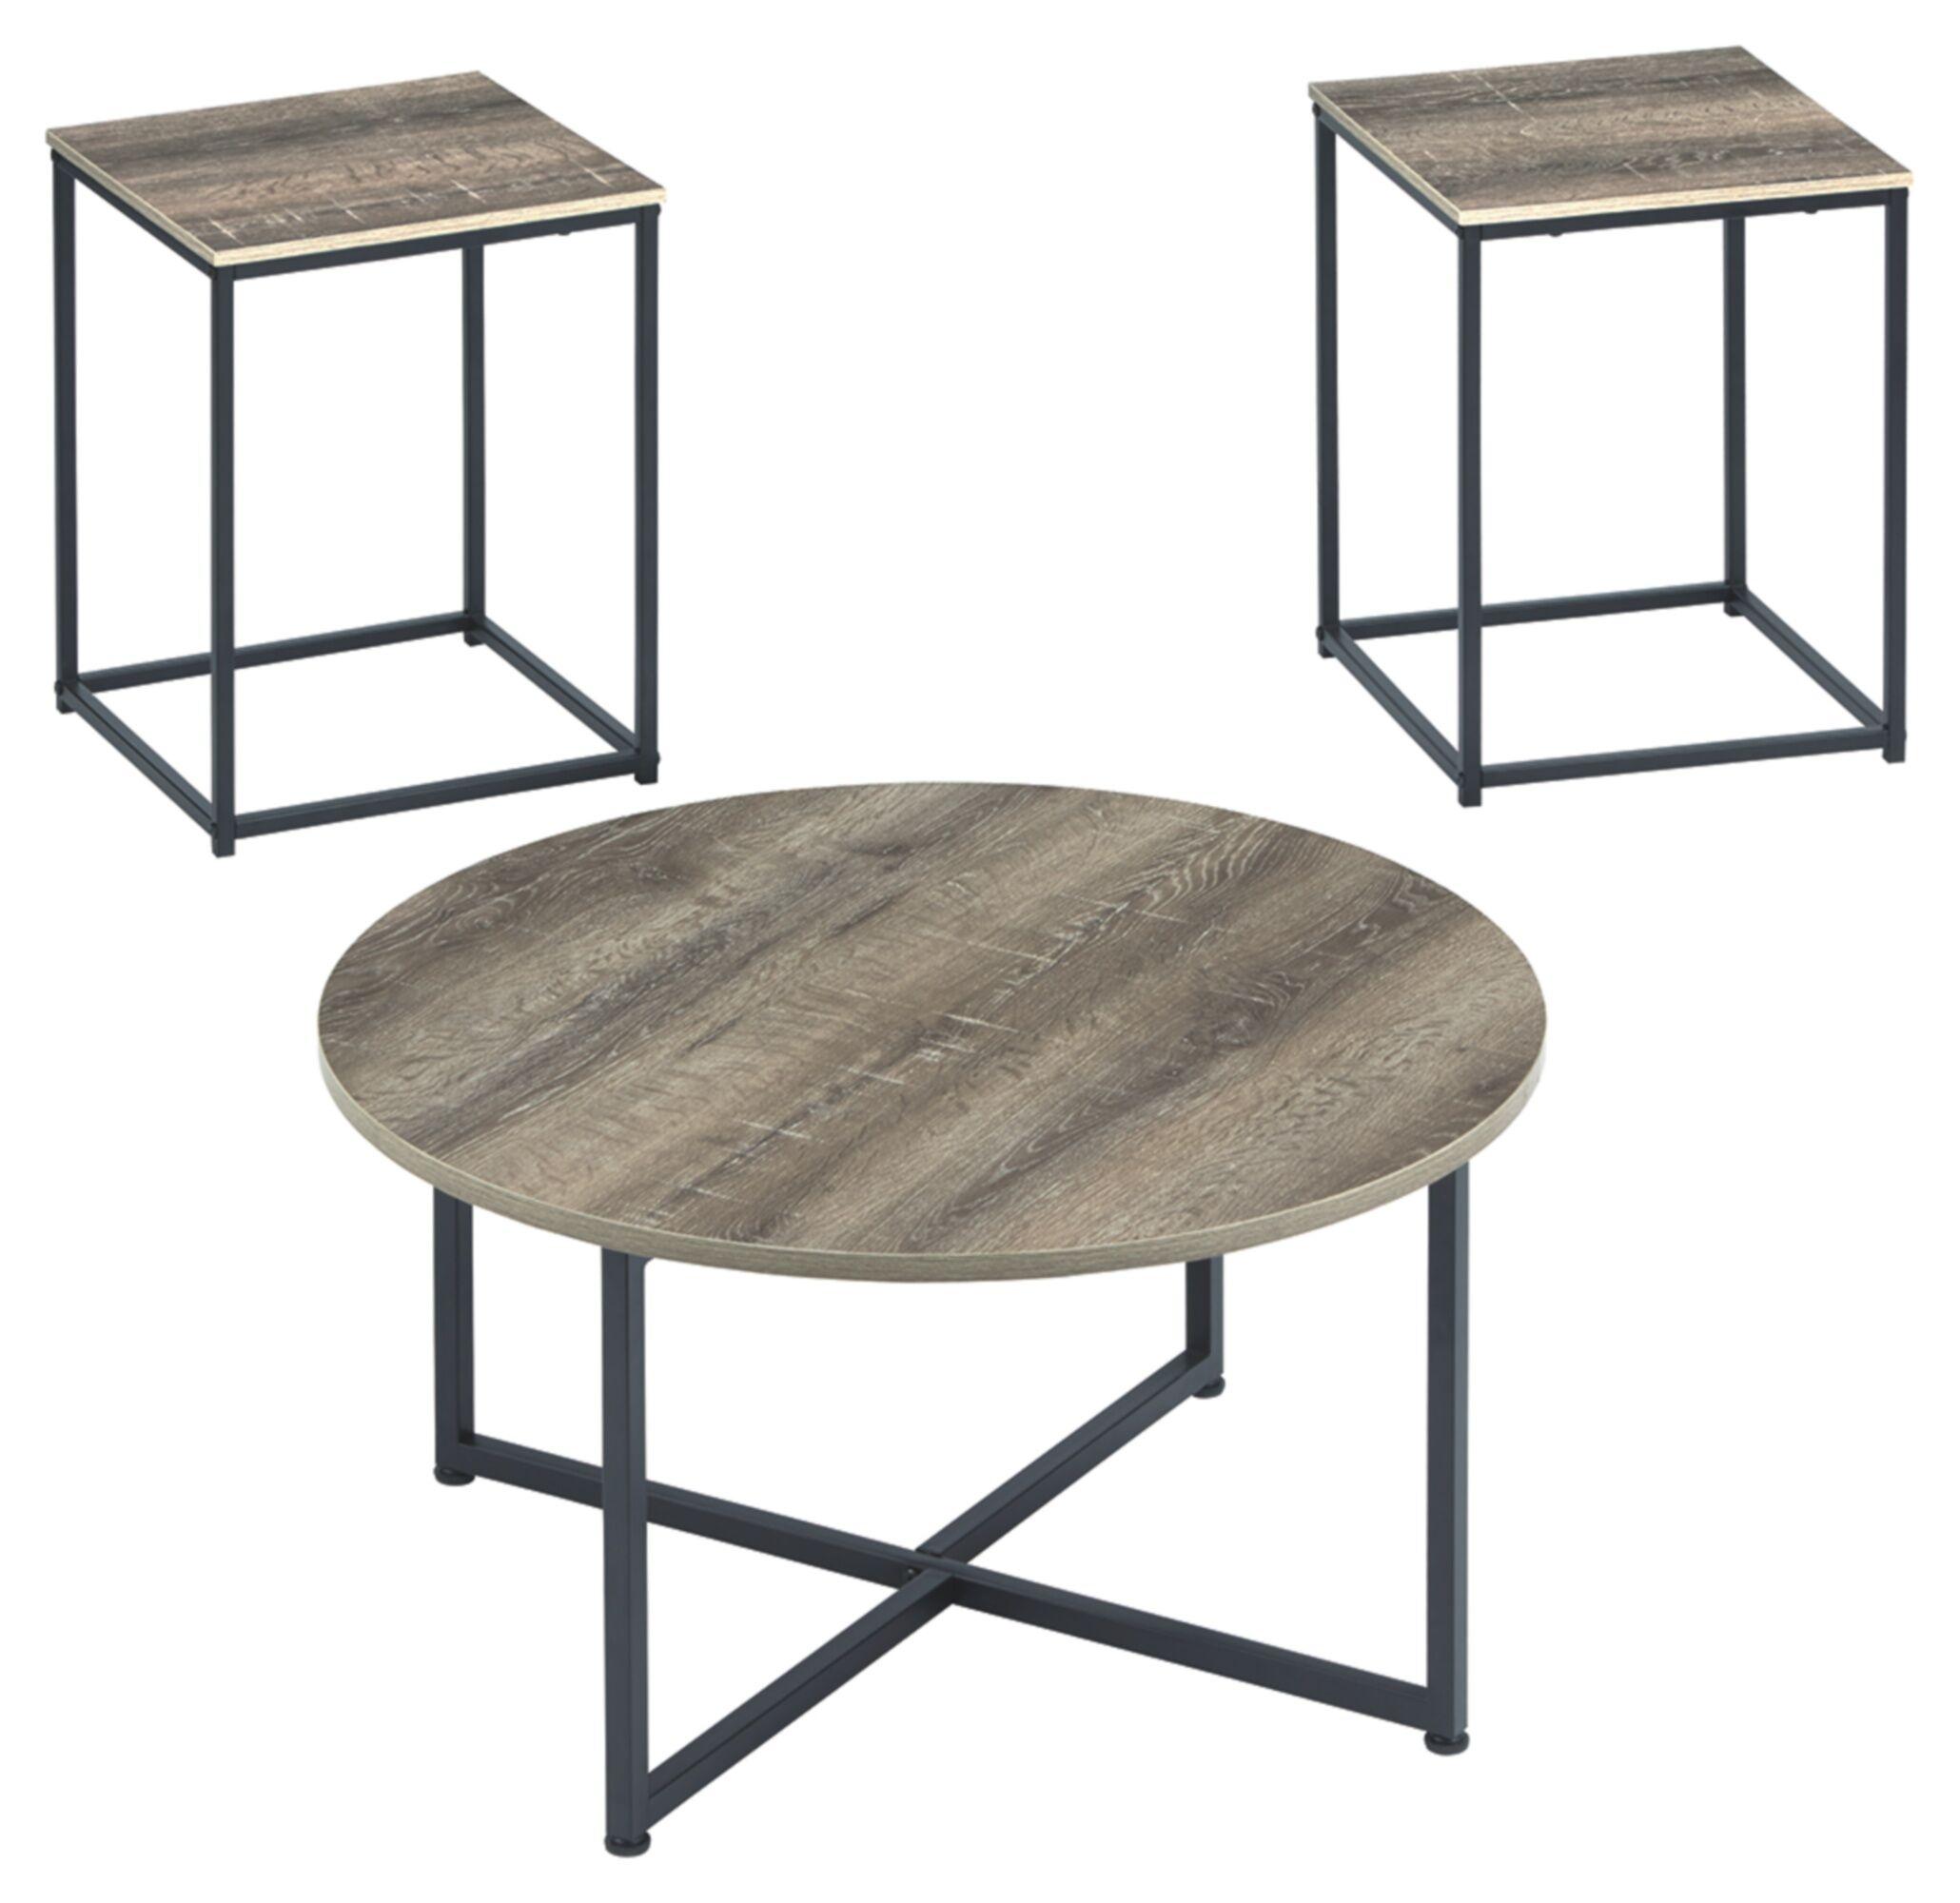 Wing Wadeworth 3 Piece Coffee Table Set